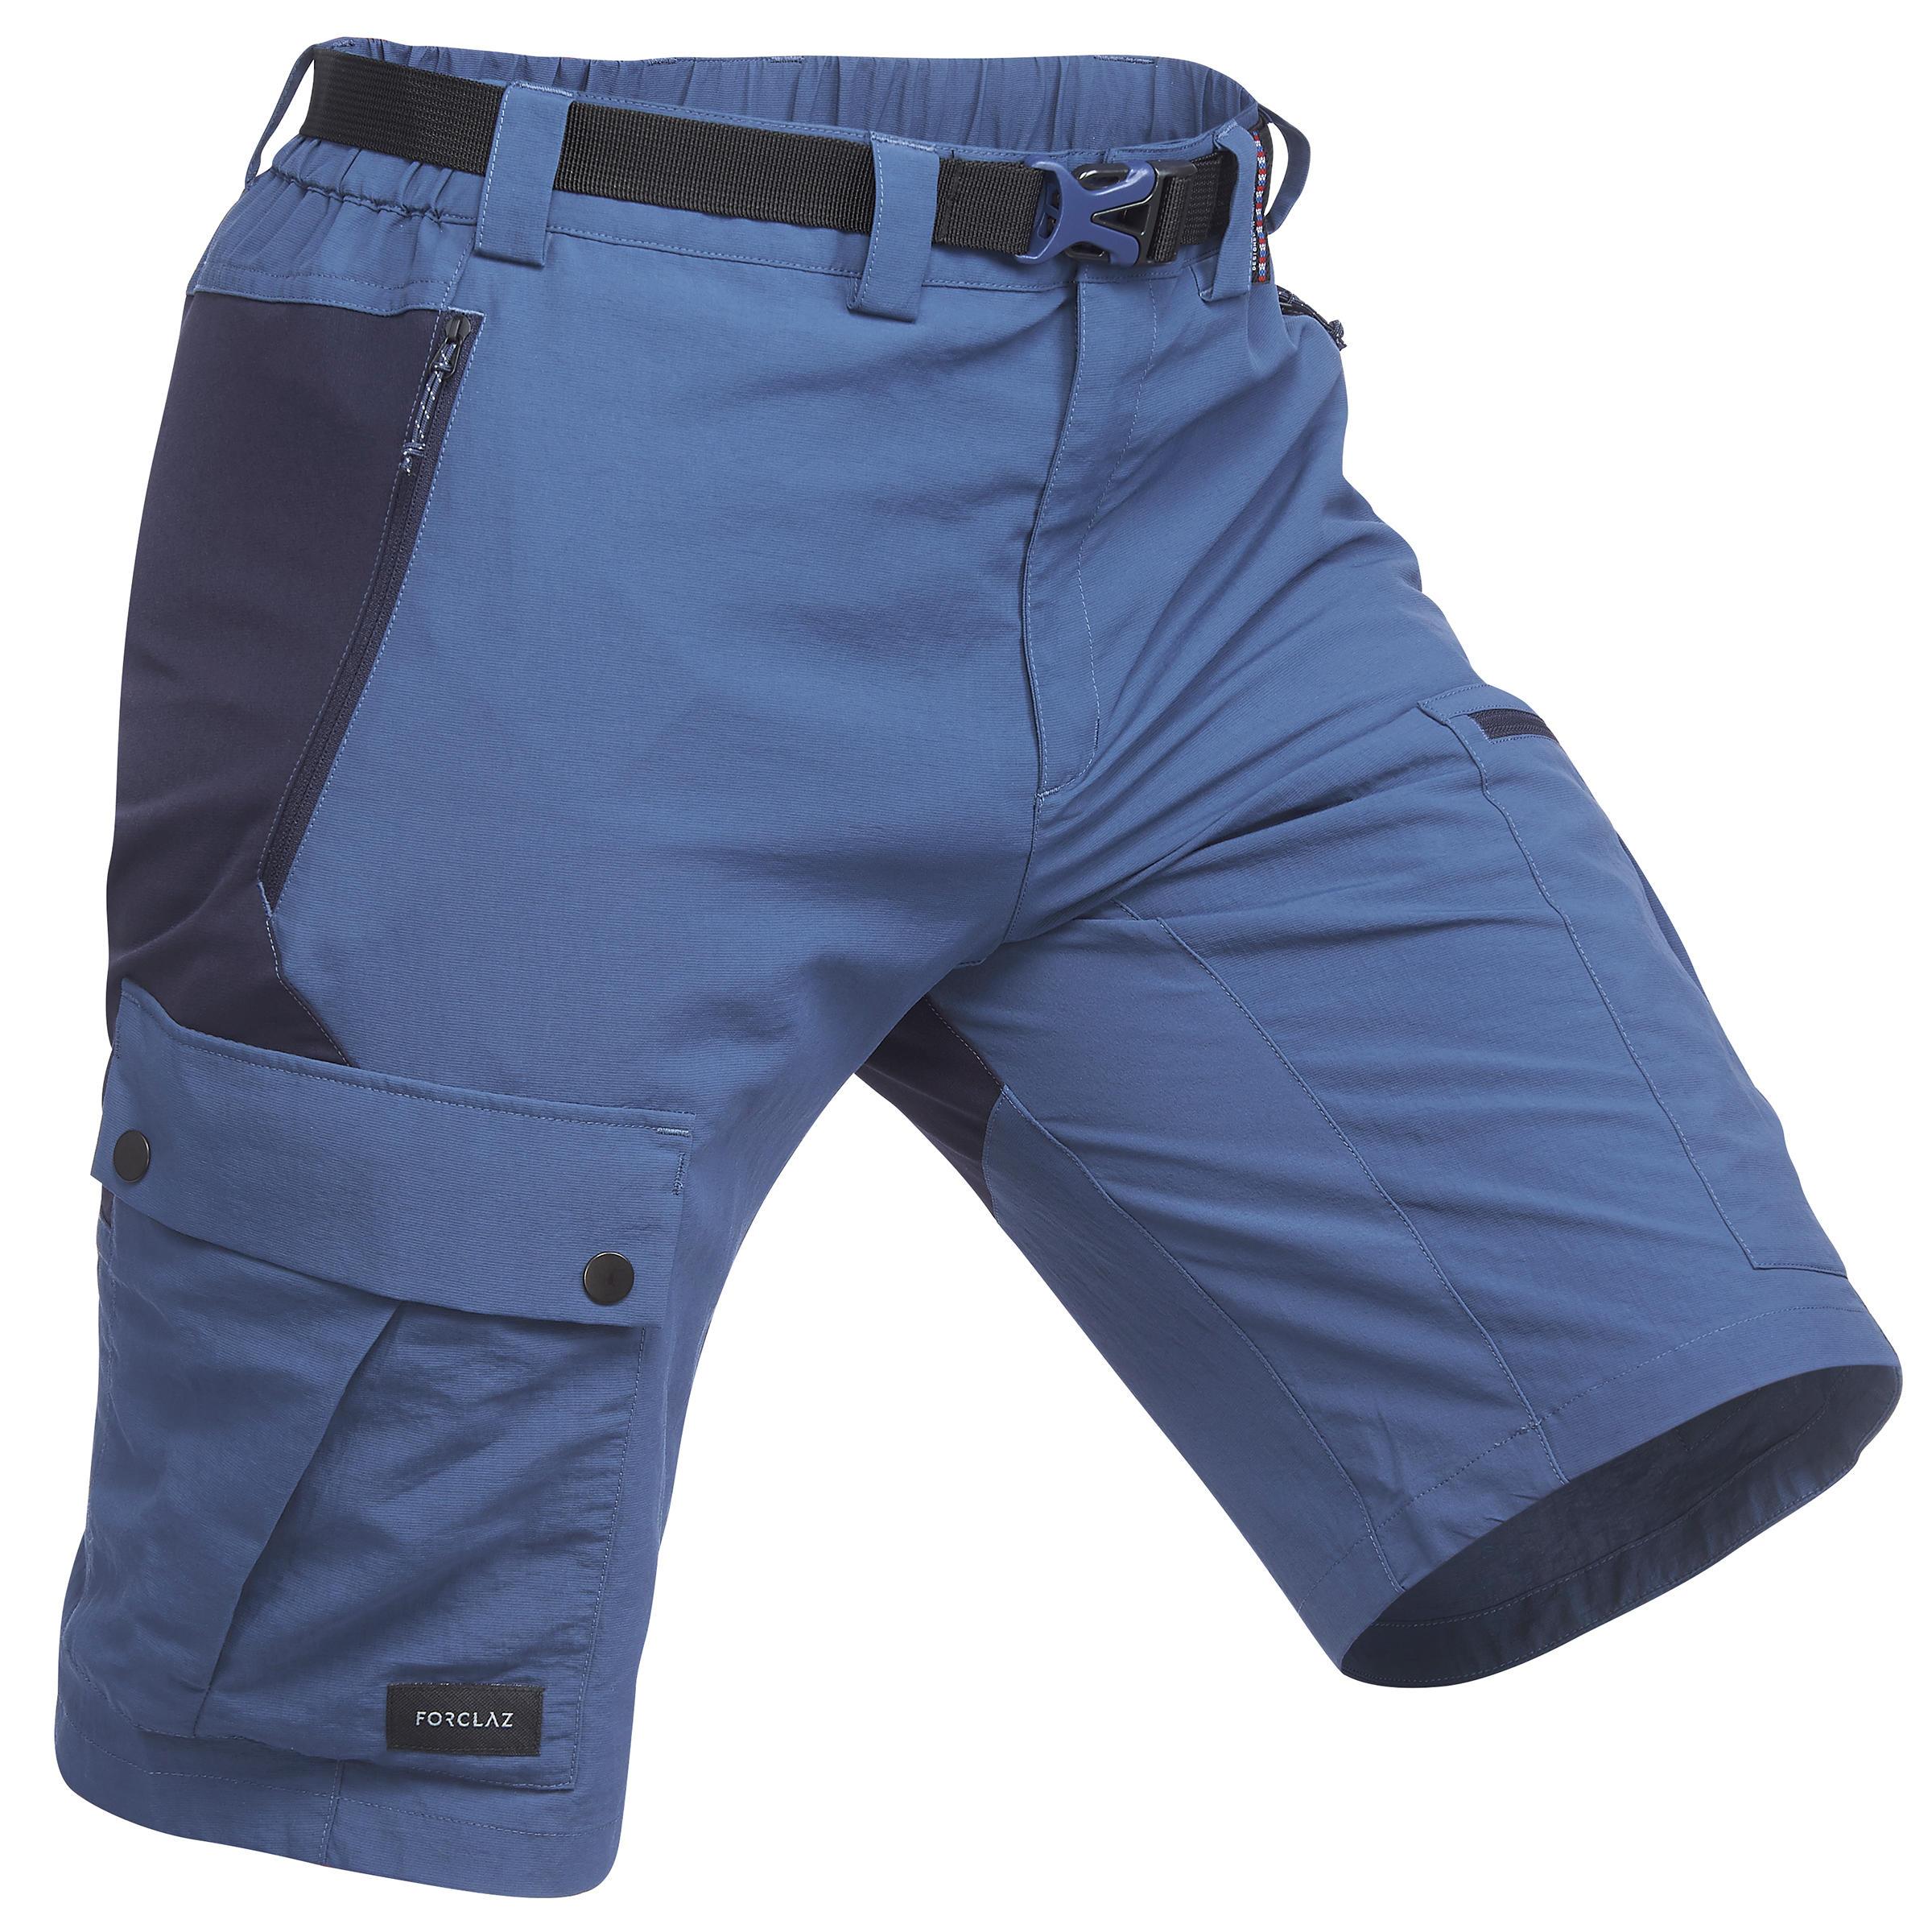 Pantalones Cortos Adidas Decathlon Online Shopping For Women Men Kids Fashion Lifestyle Free Delivery Returns